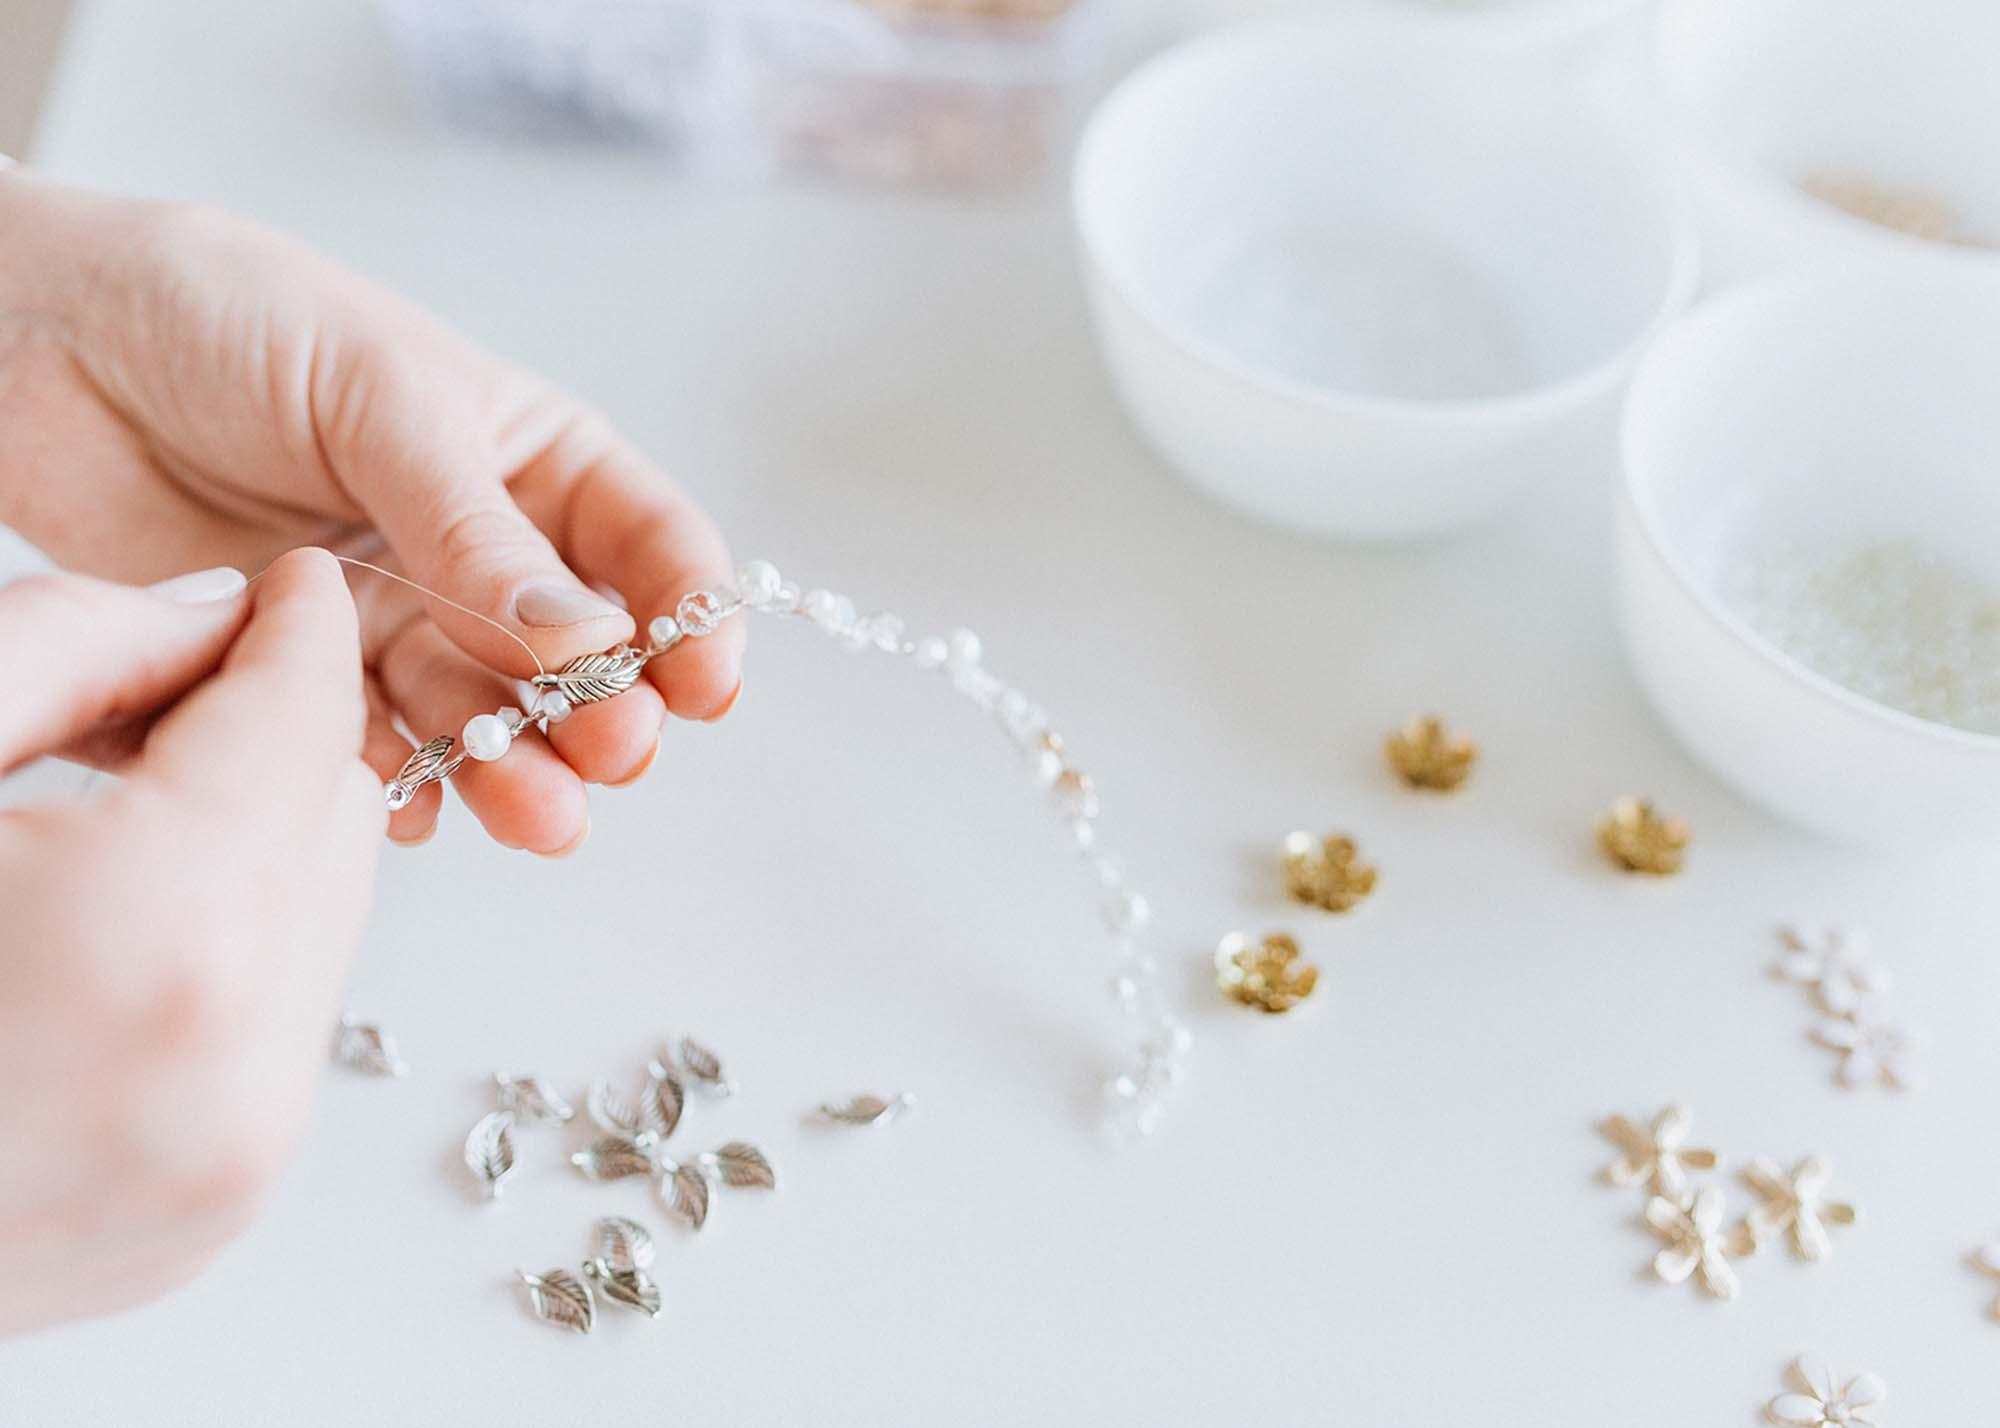 jewelry-making-victorias-veils-1.jpg